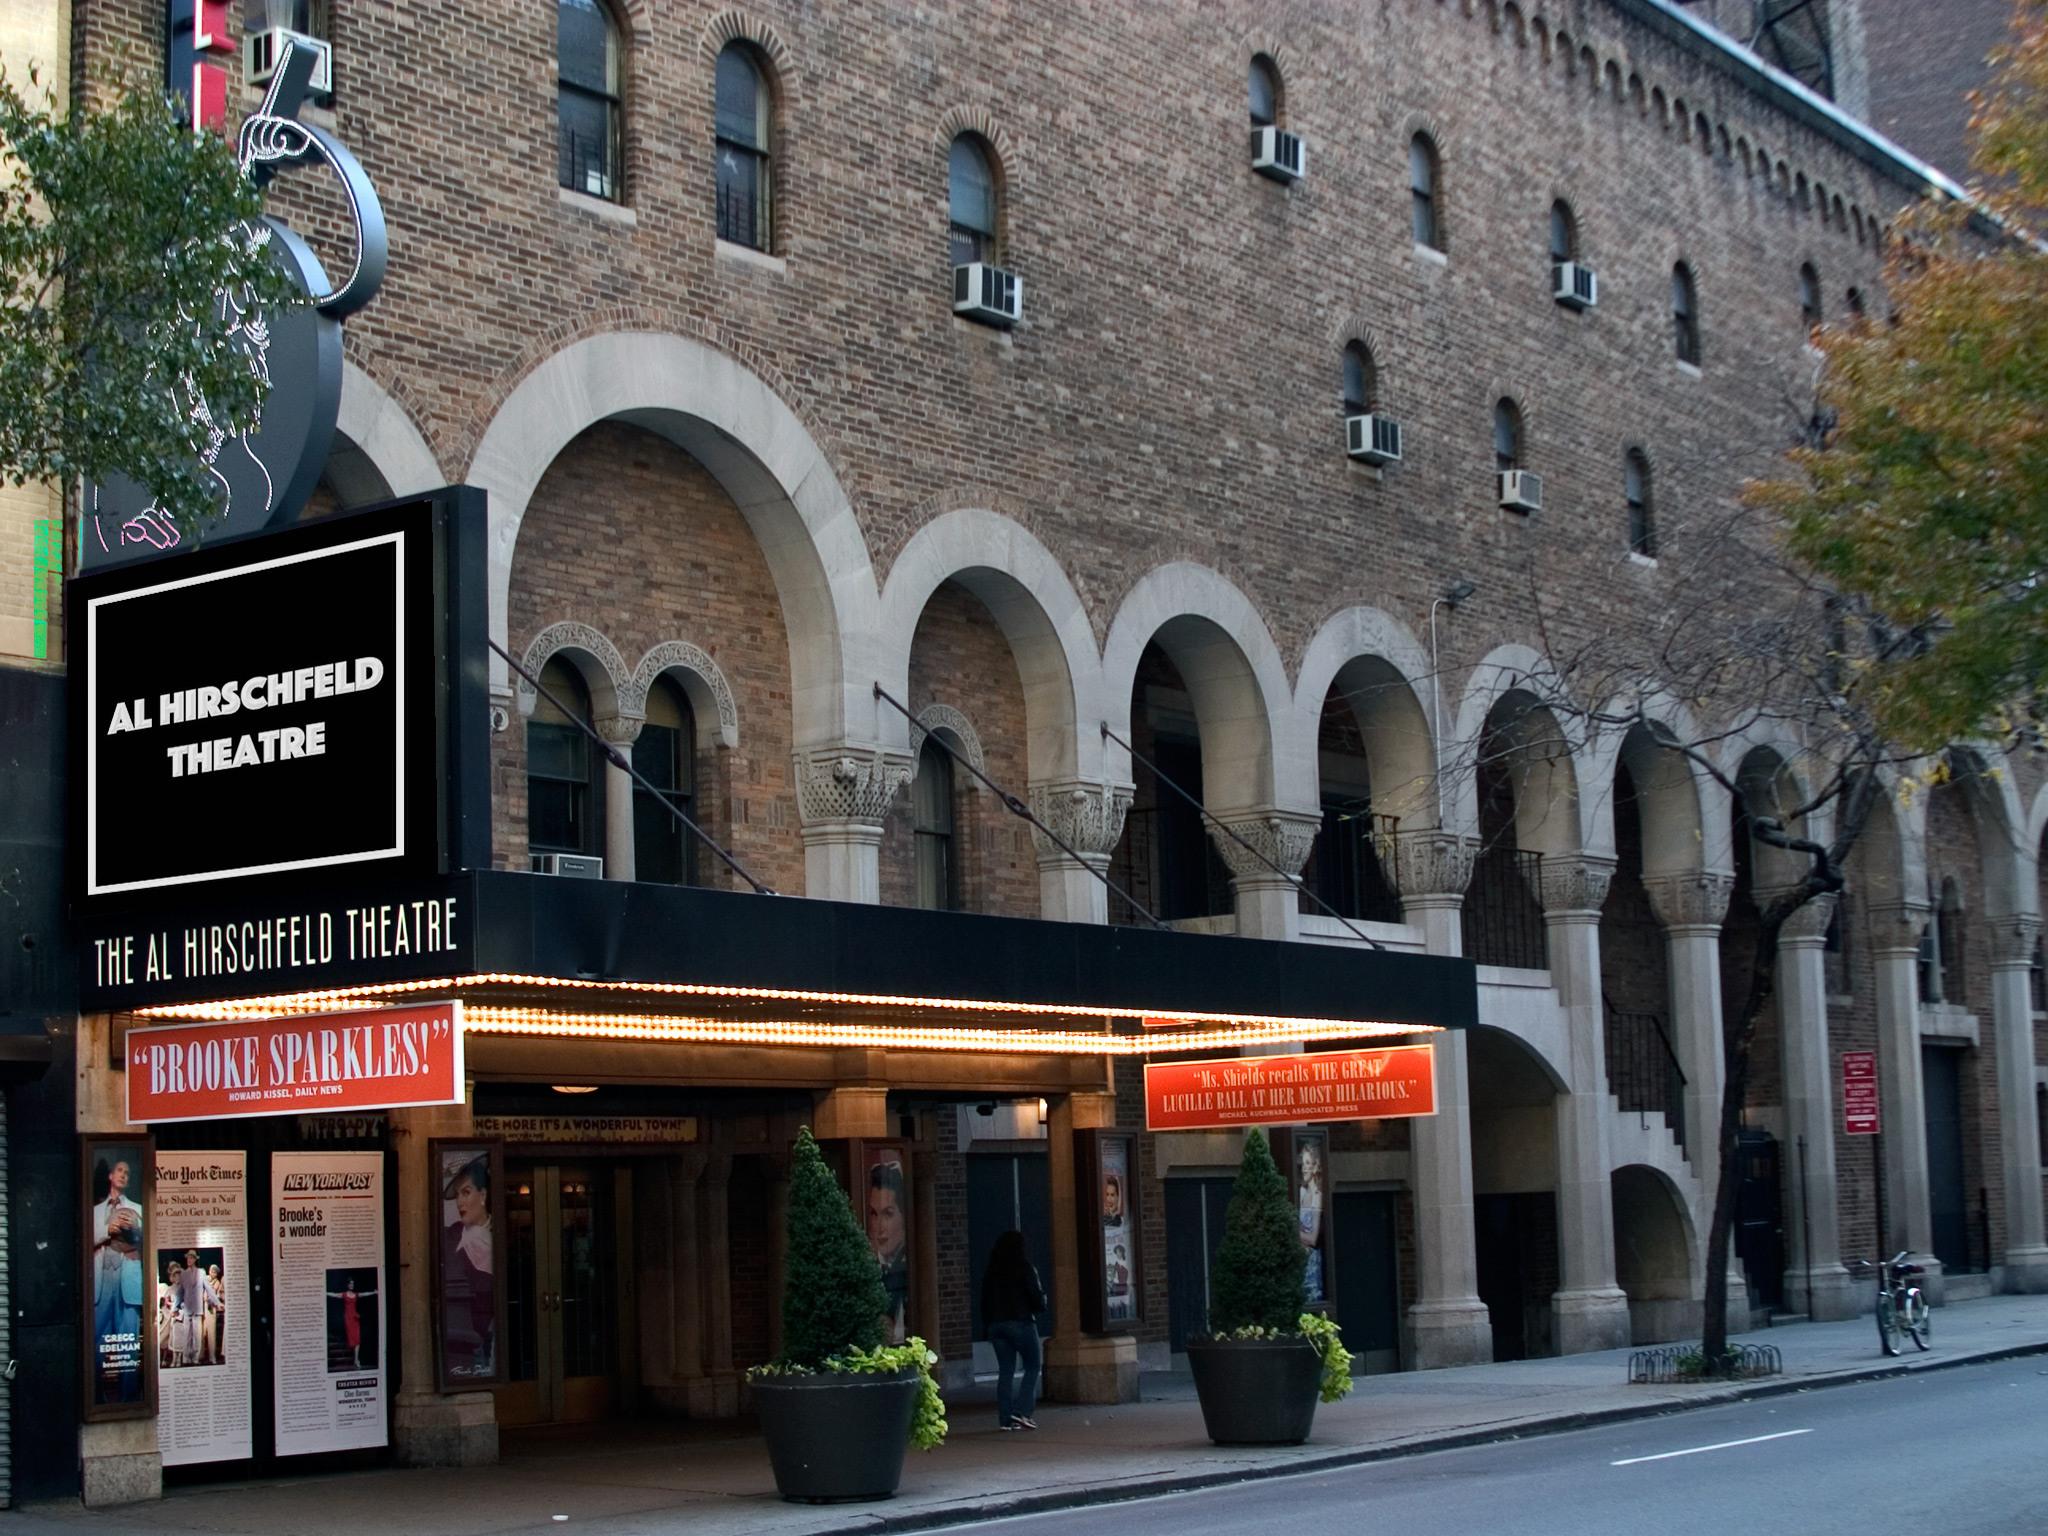 Al Hirschfeld Theatre on Broadway